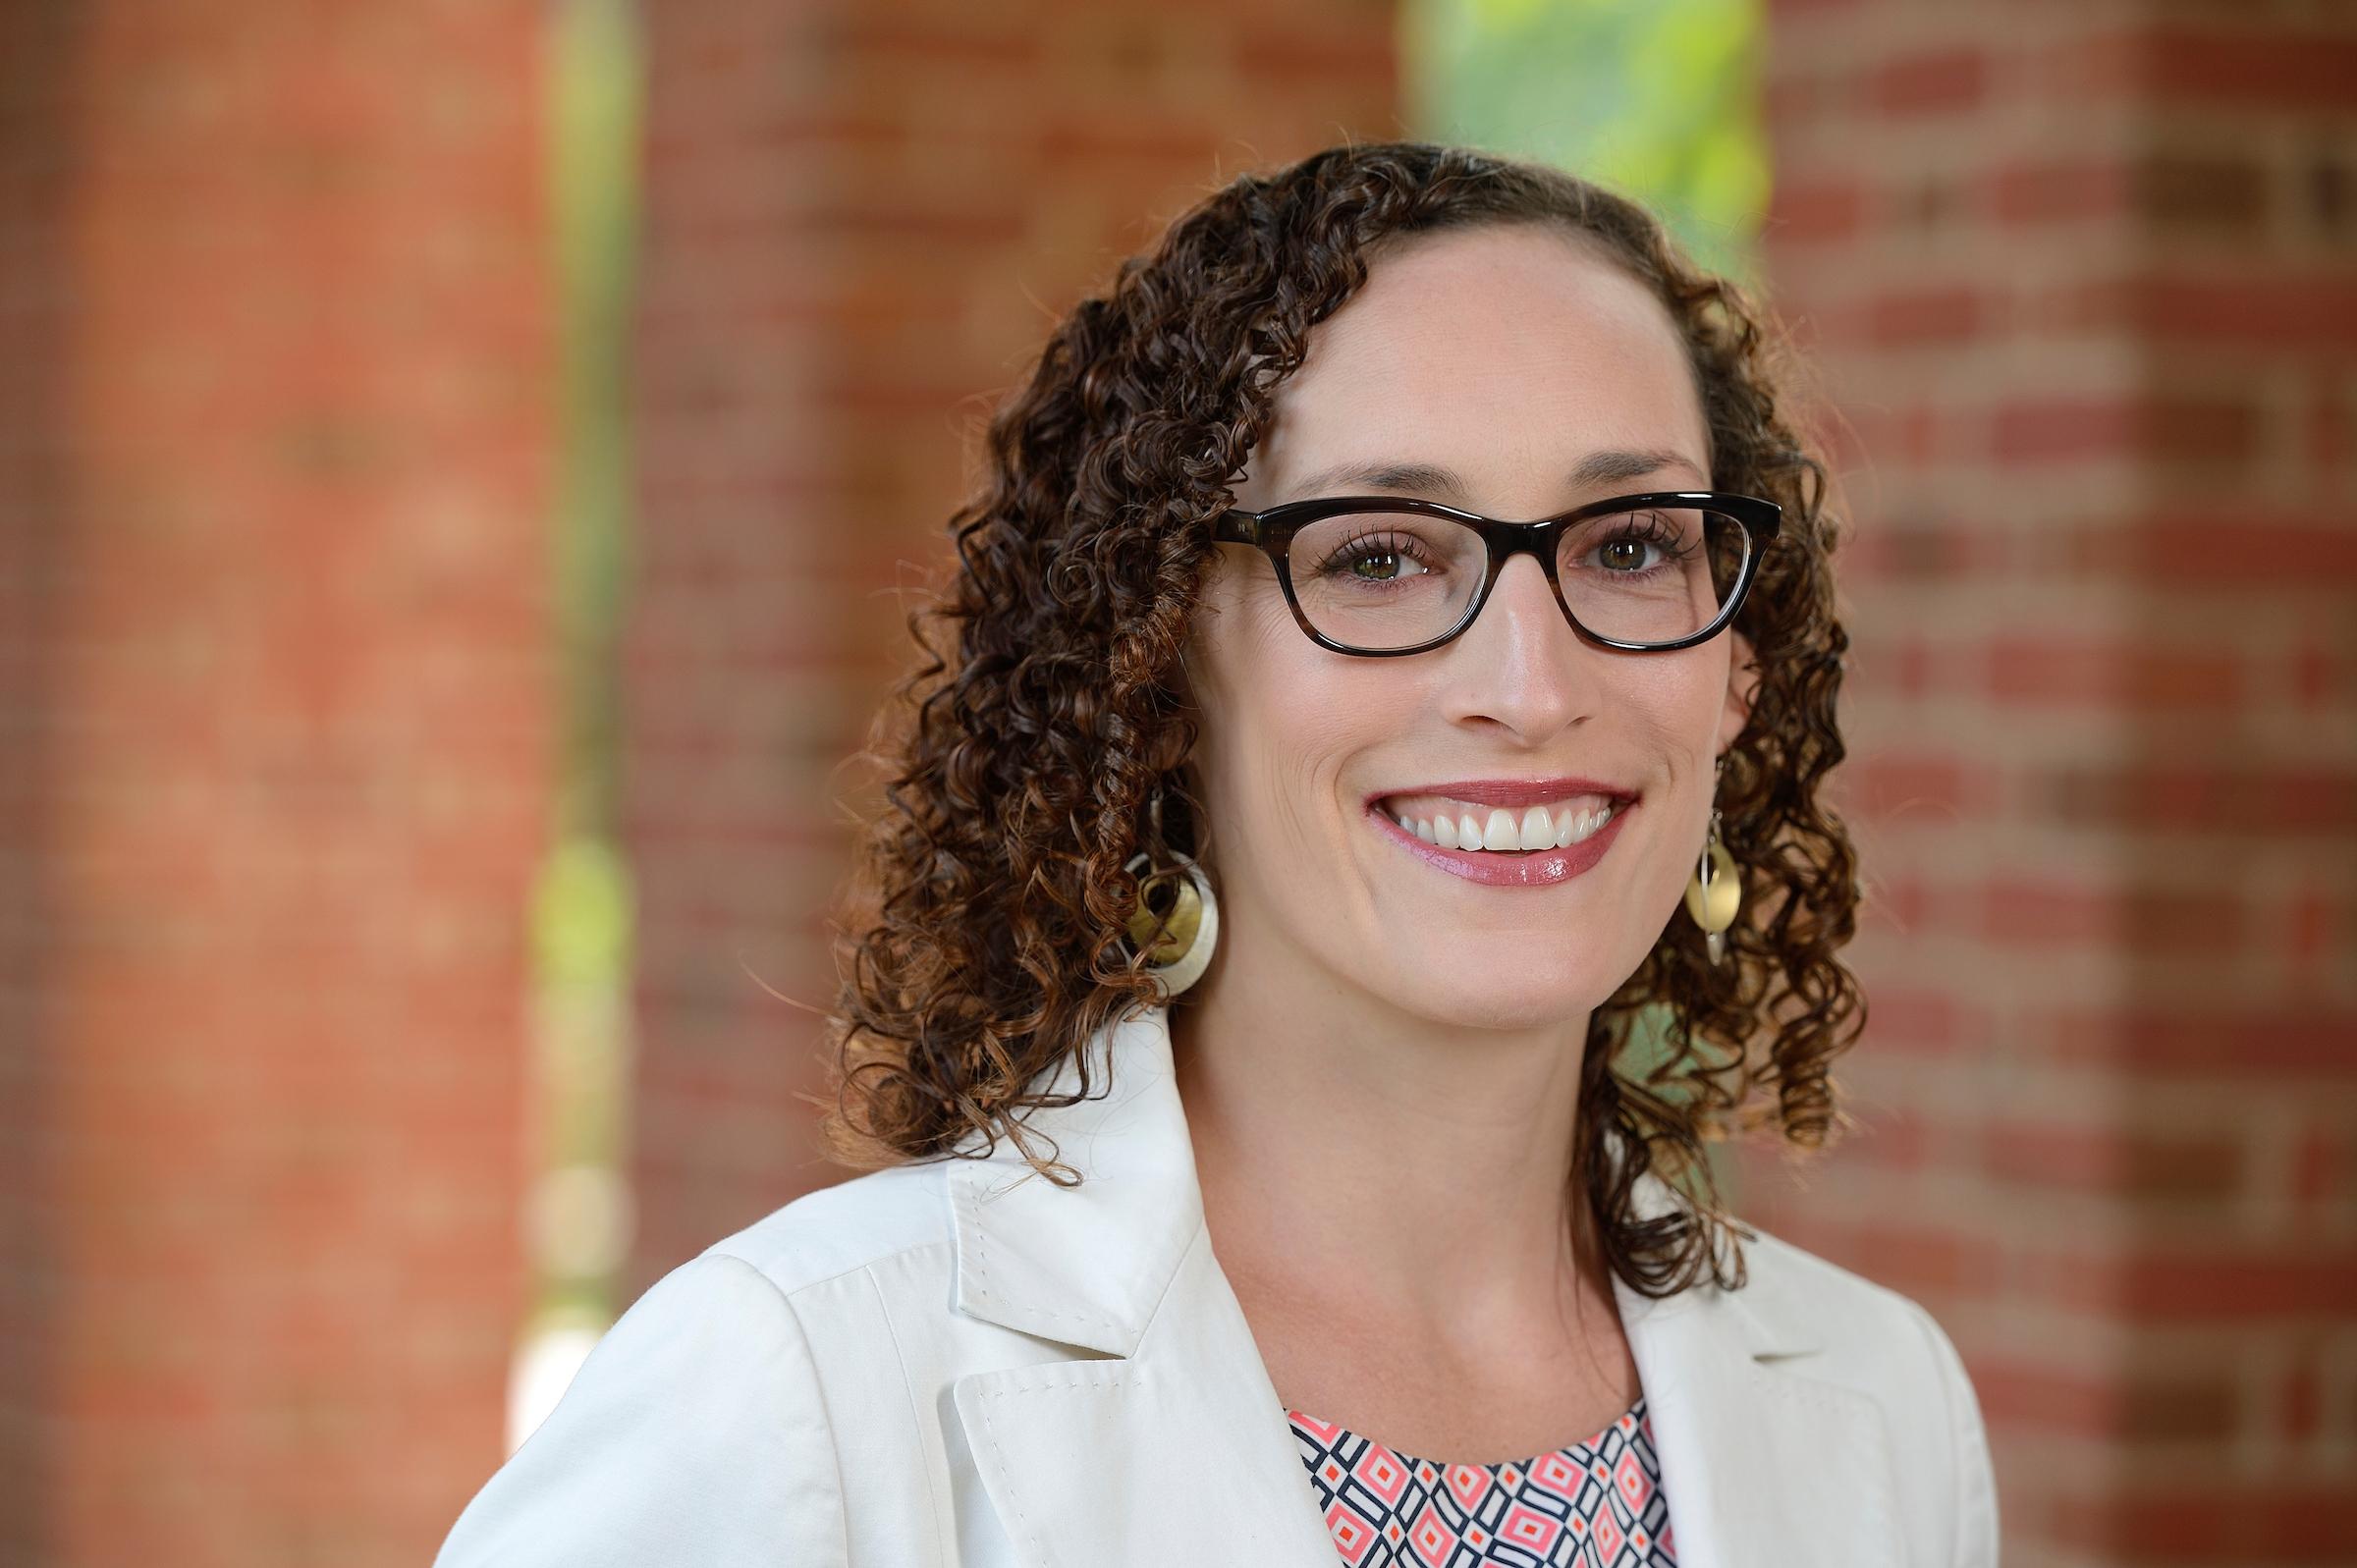 Bloomberg Distinguished Professor Vesla Weaver